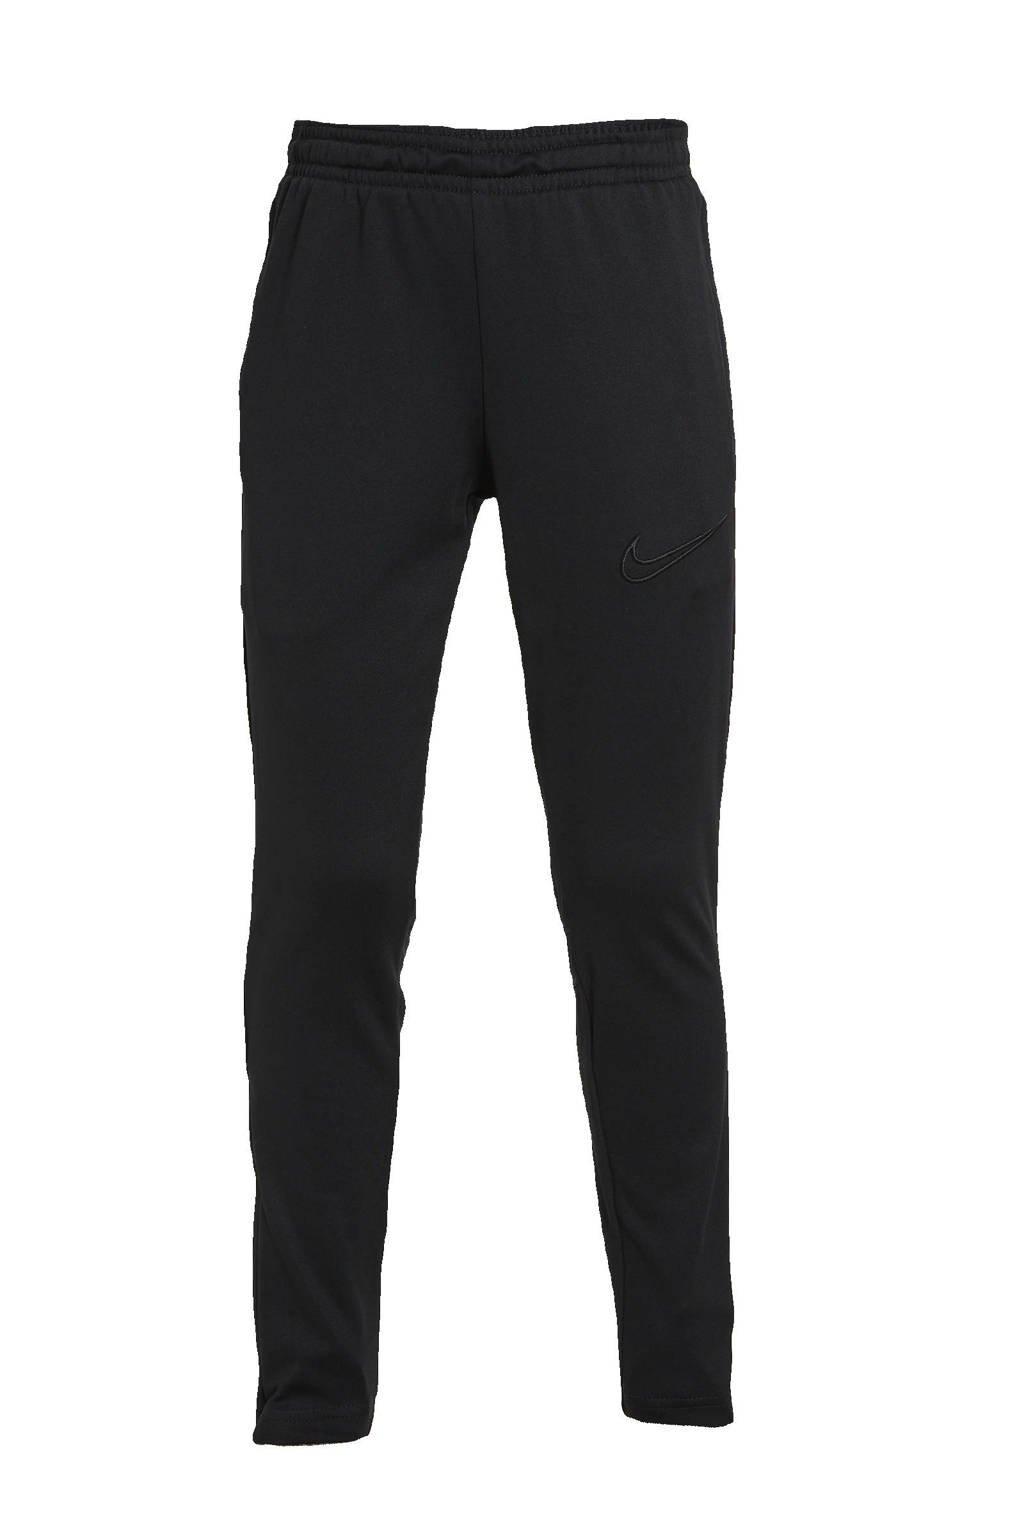 Nike Junior  trainingsbroek zwart, Zwart